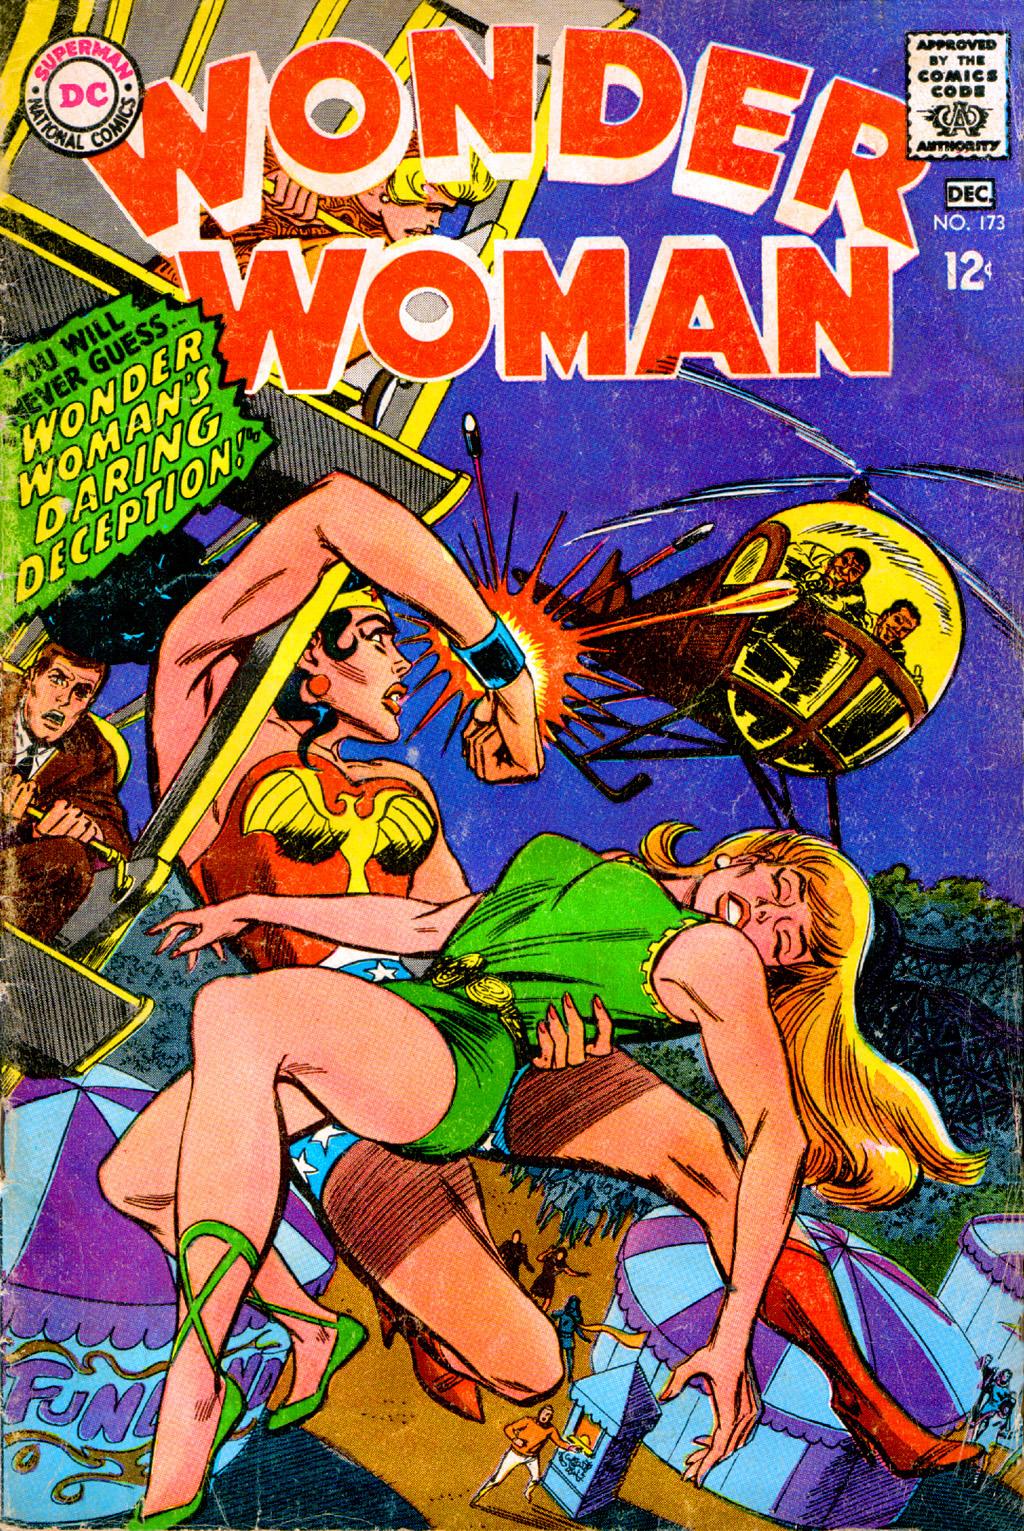 Read online Wonder Woman (1942) comic -  Issue #173 - 1